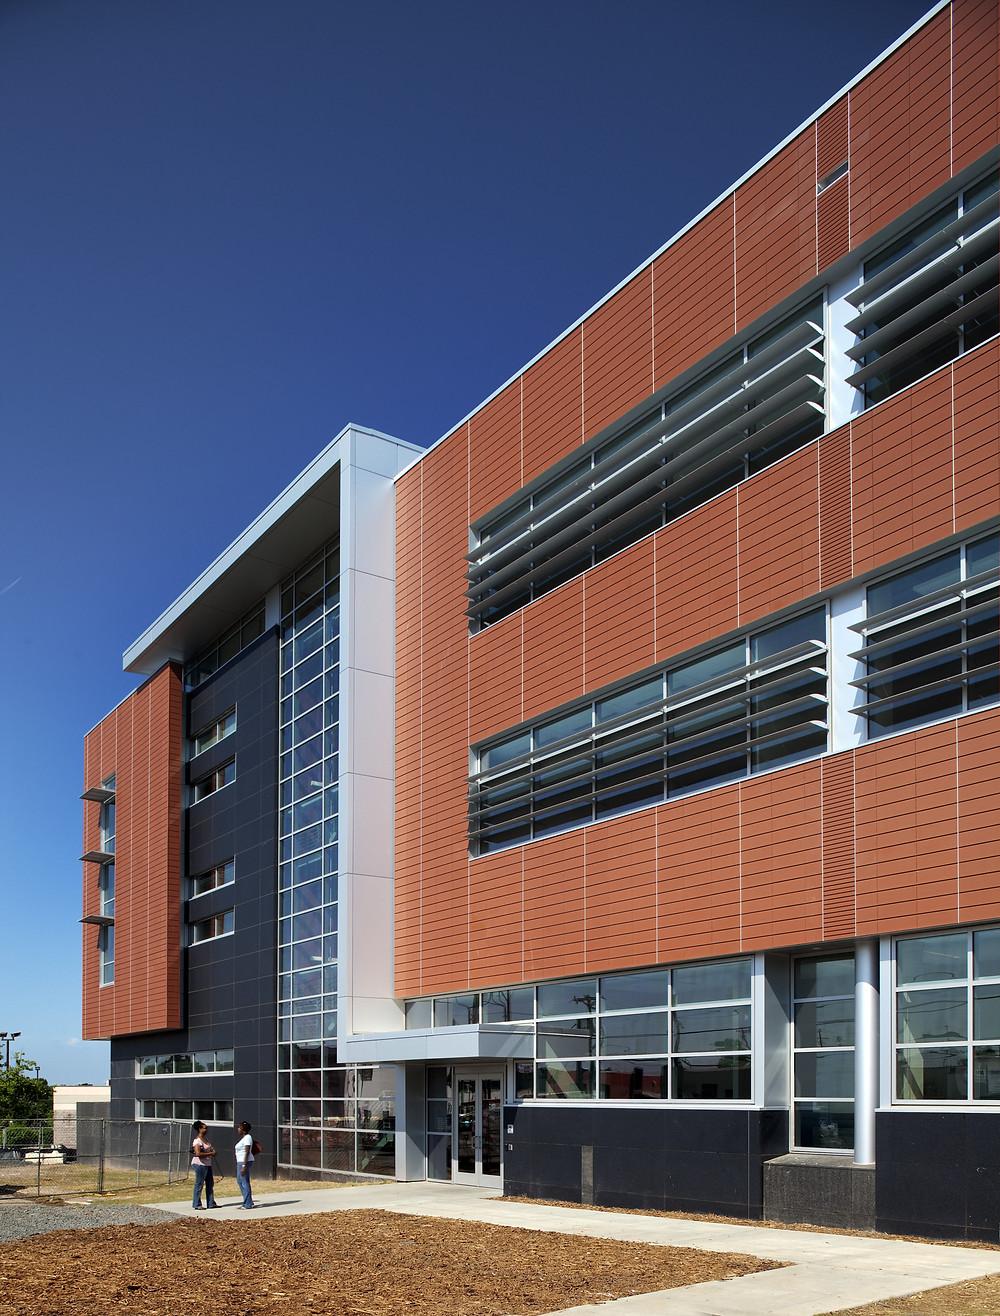 Terracotta Rainscreen Facade System Case Study in Durham, NC